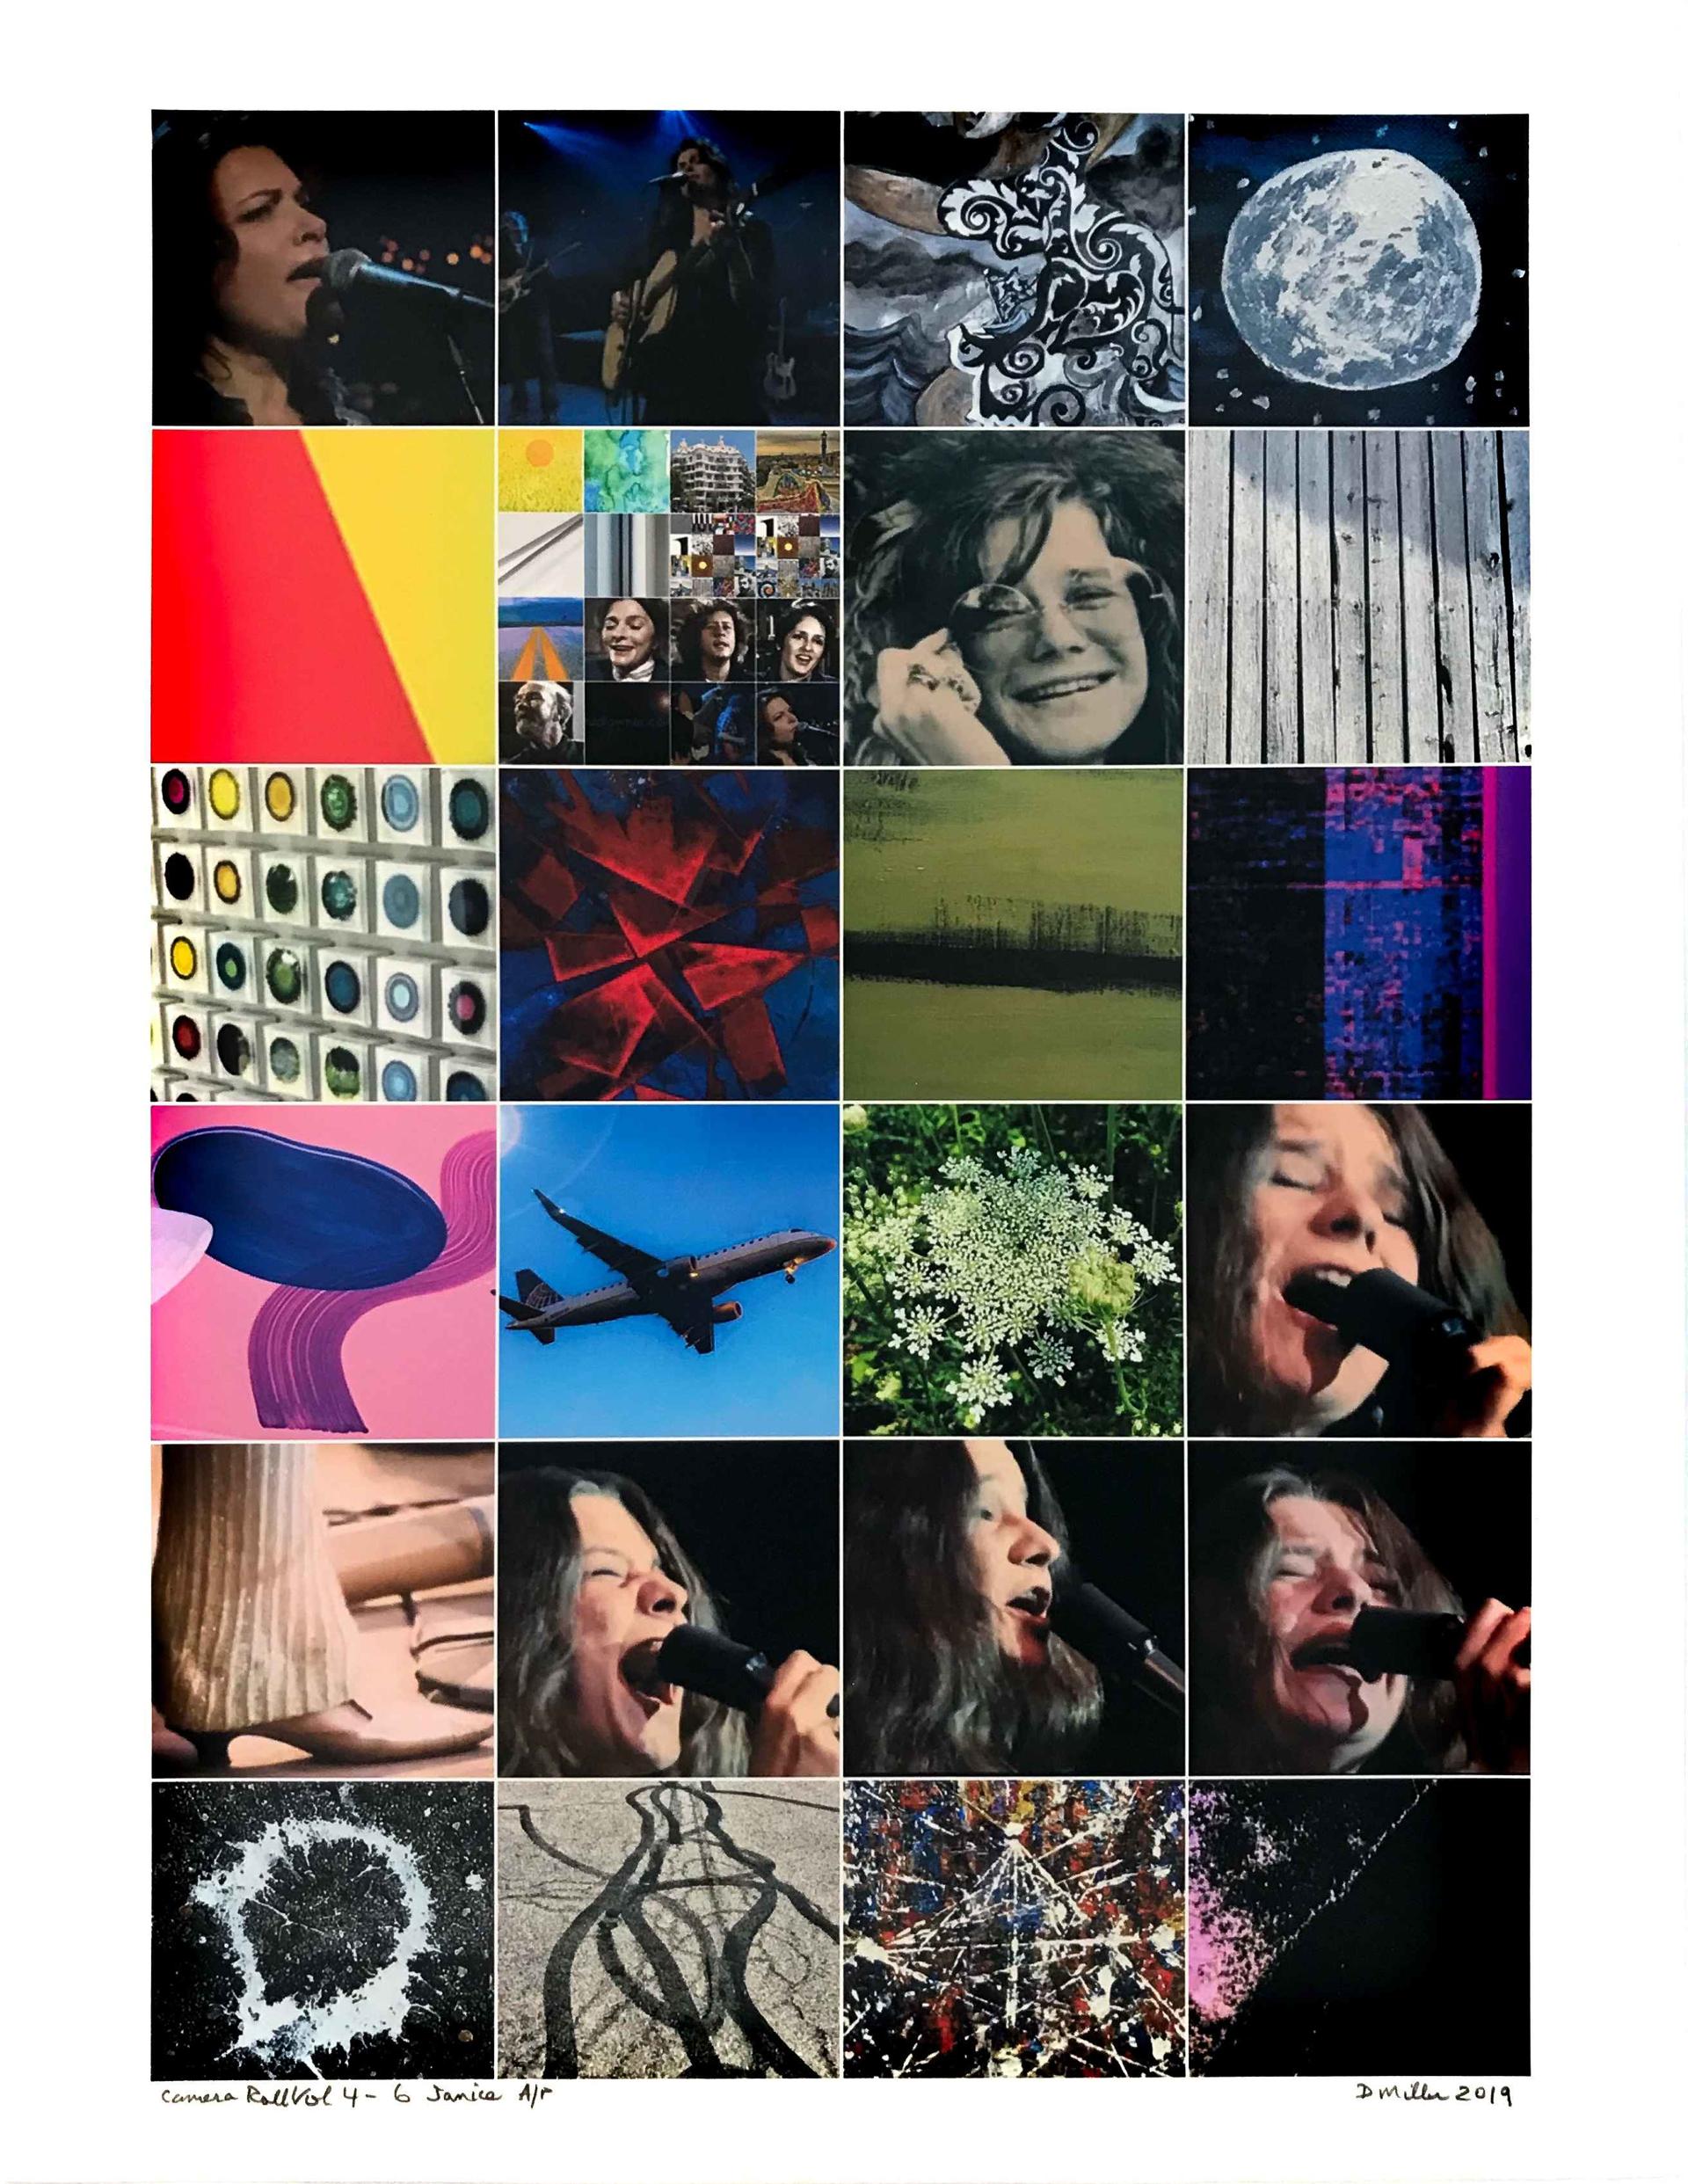 Camera Roll Vol 4-6 Janice by David Miller